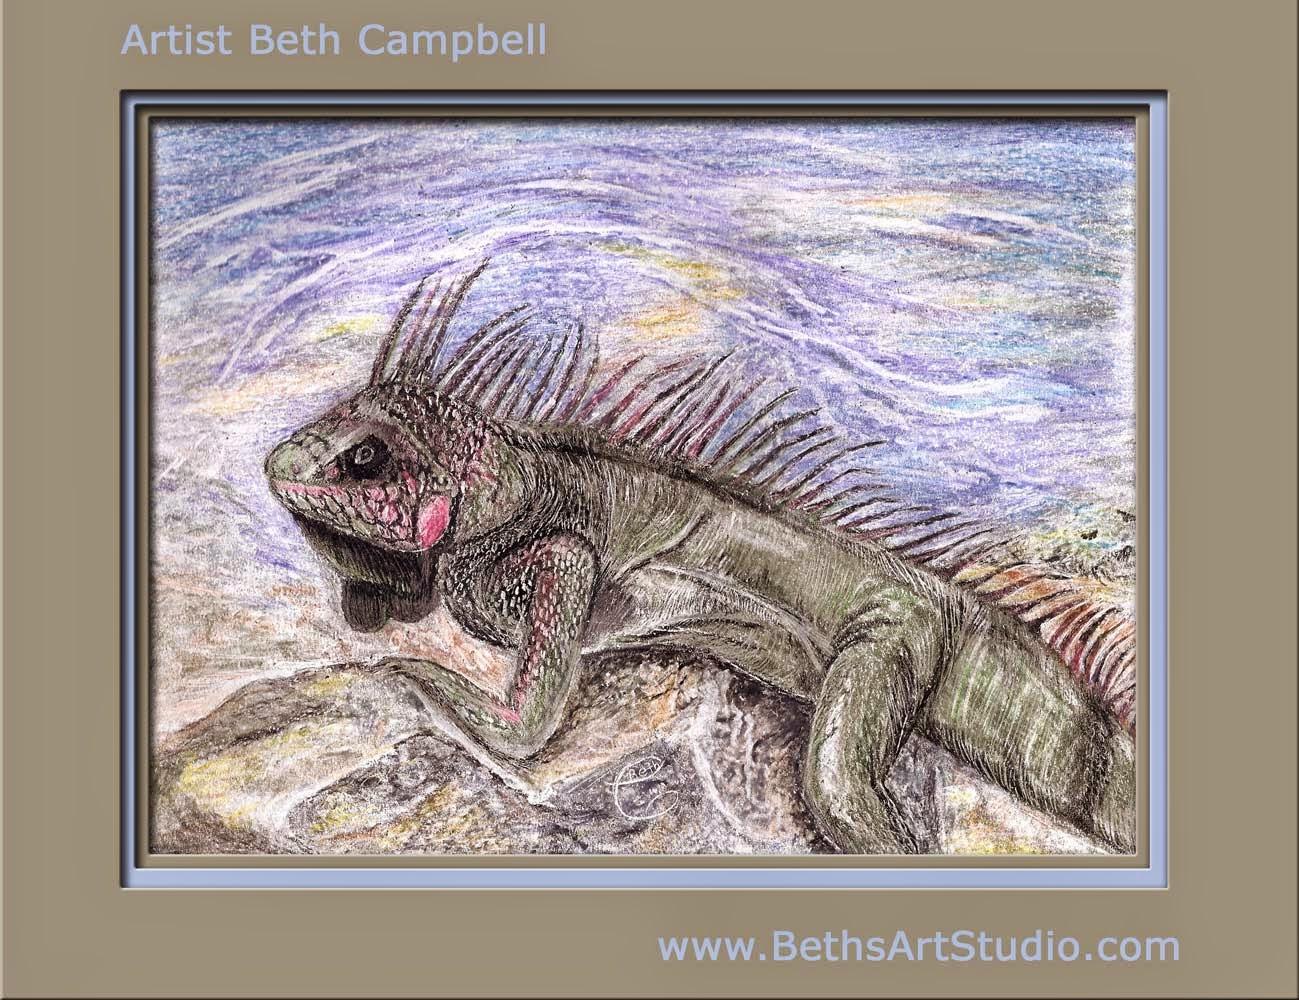 Iguana crayola crayon painting Beth Campbell